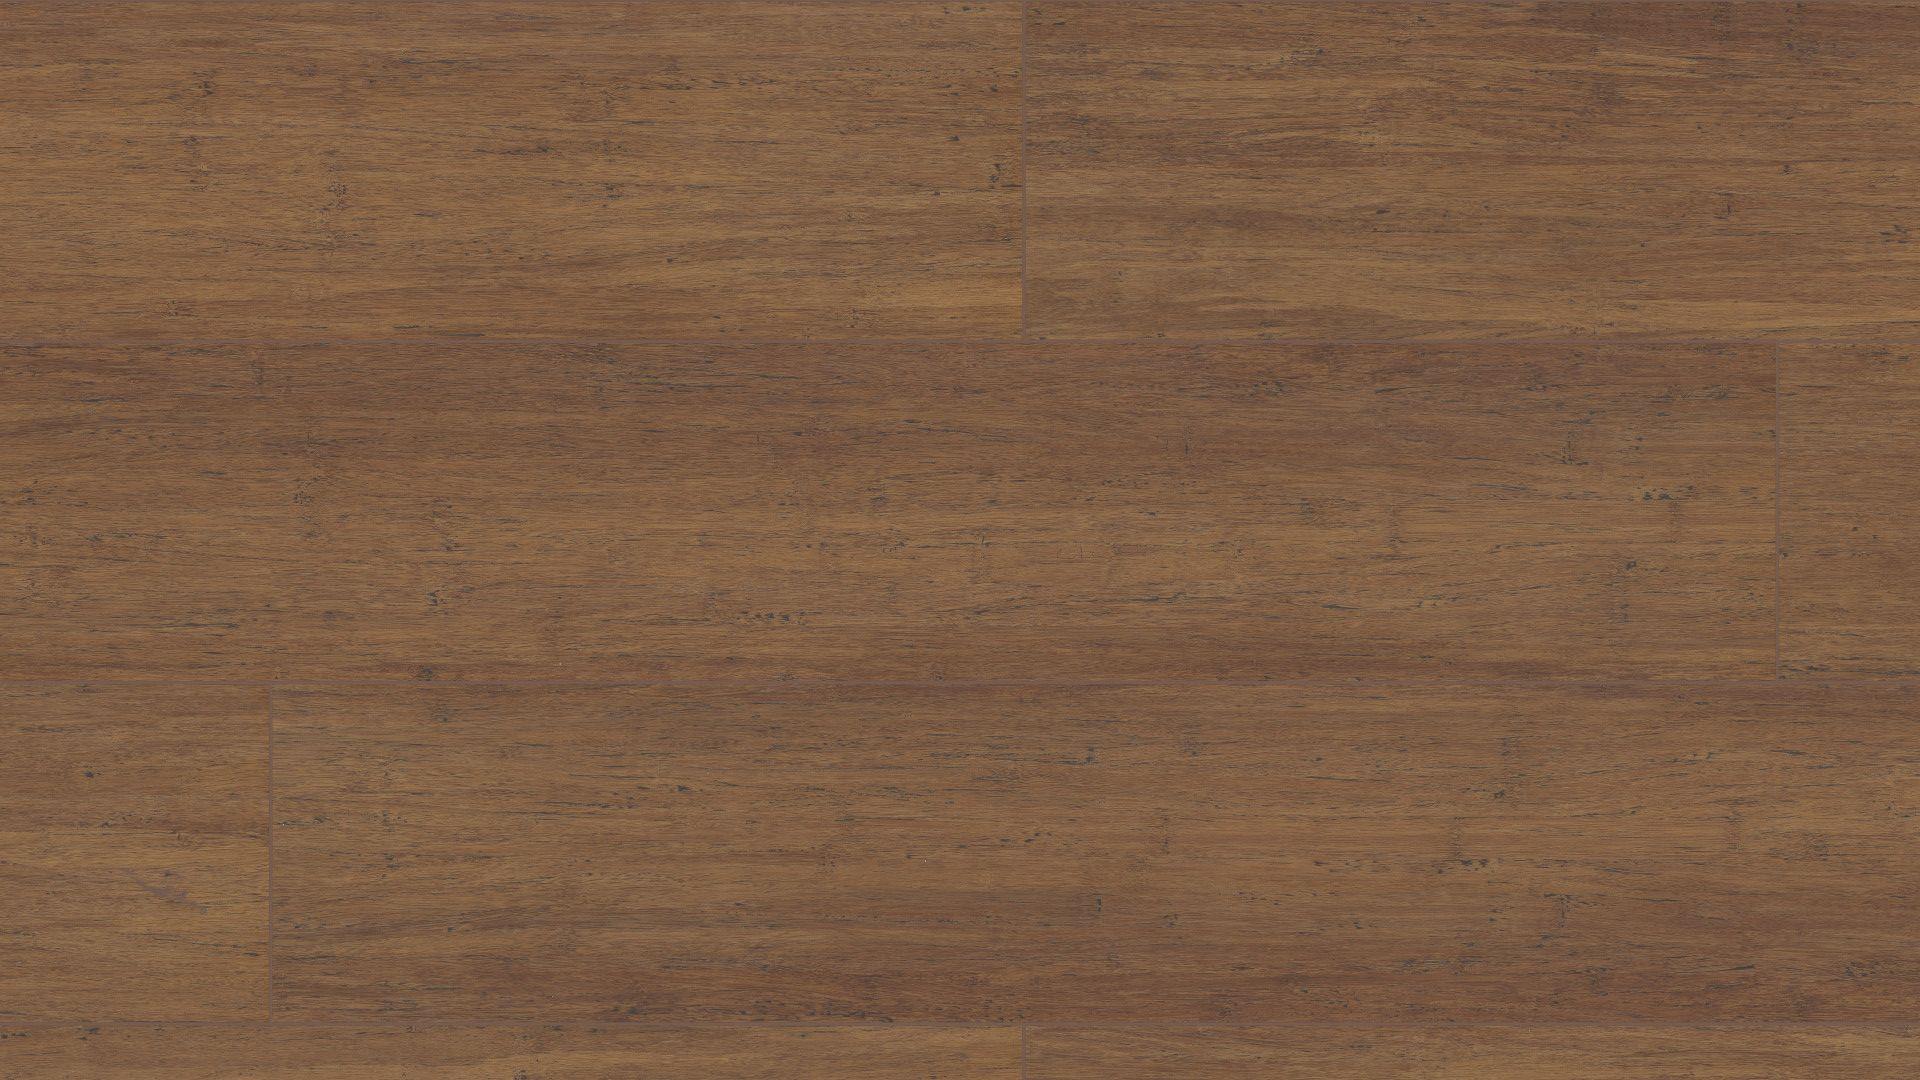 Coretec Pro Plus Enhanced Planks Kendal